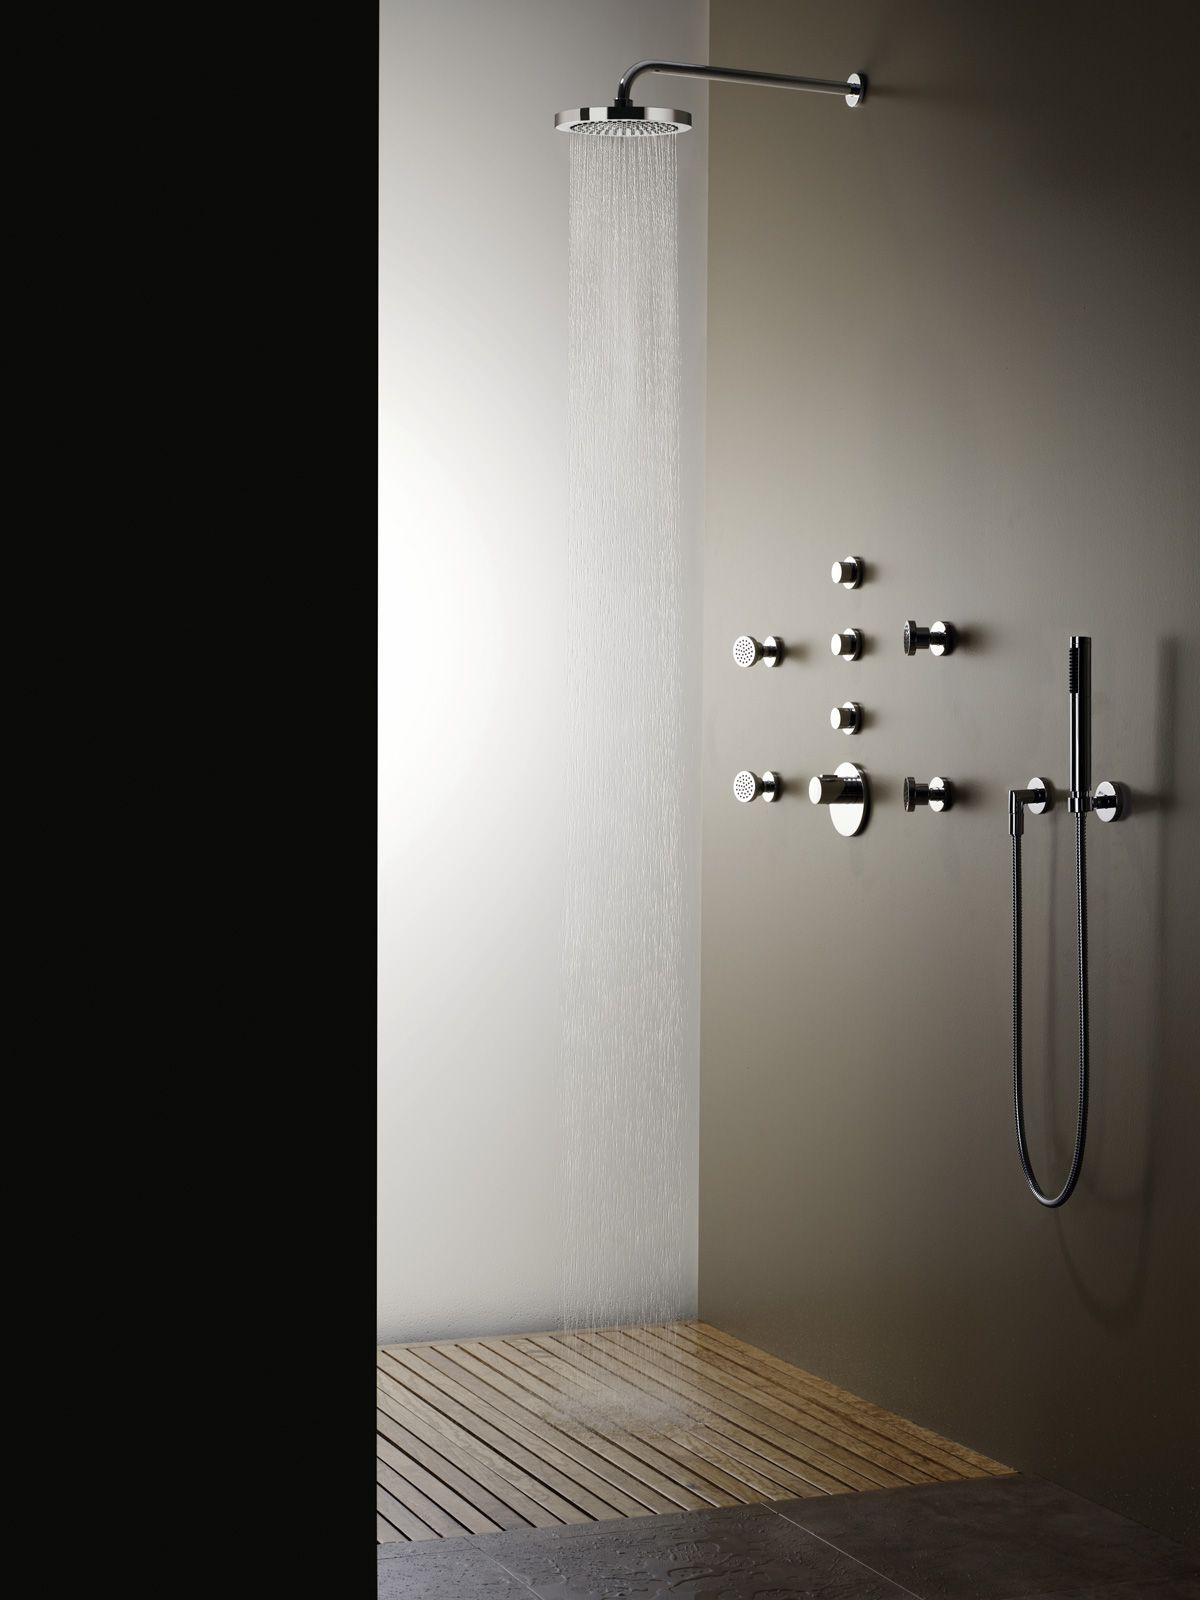 Dornbracht Kitchen Faucets Hobo Cabinets Meta.02 / Bath & Spa Fitting Body Sprays ...